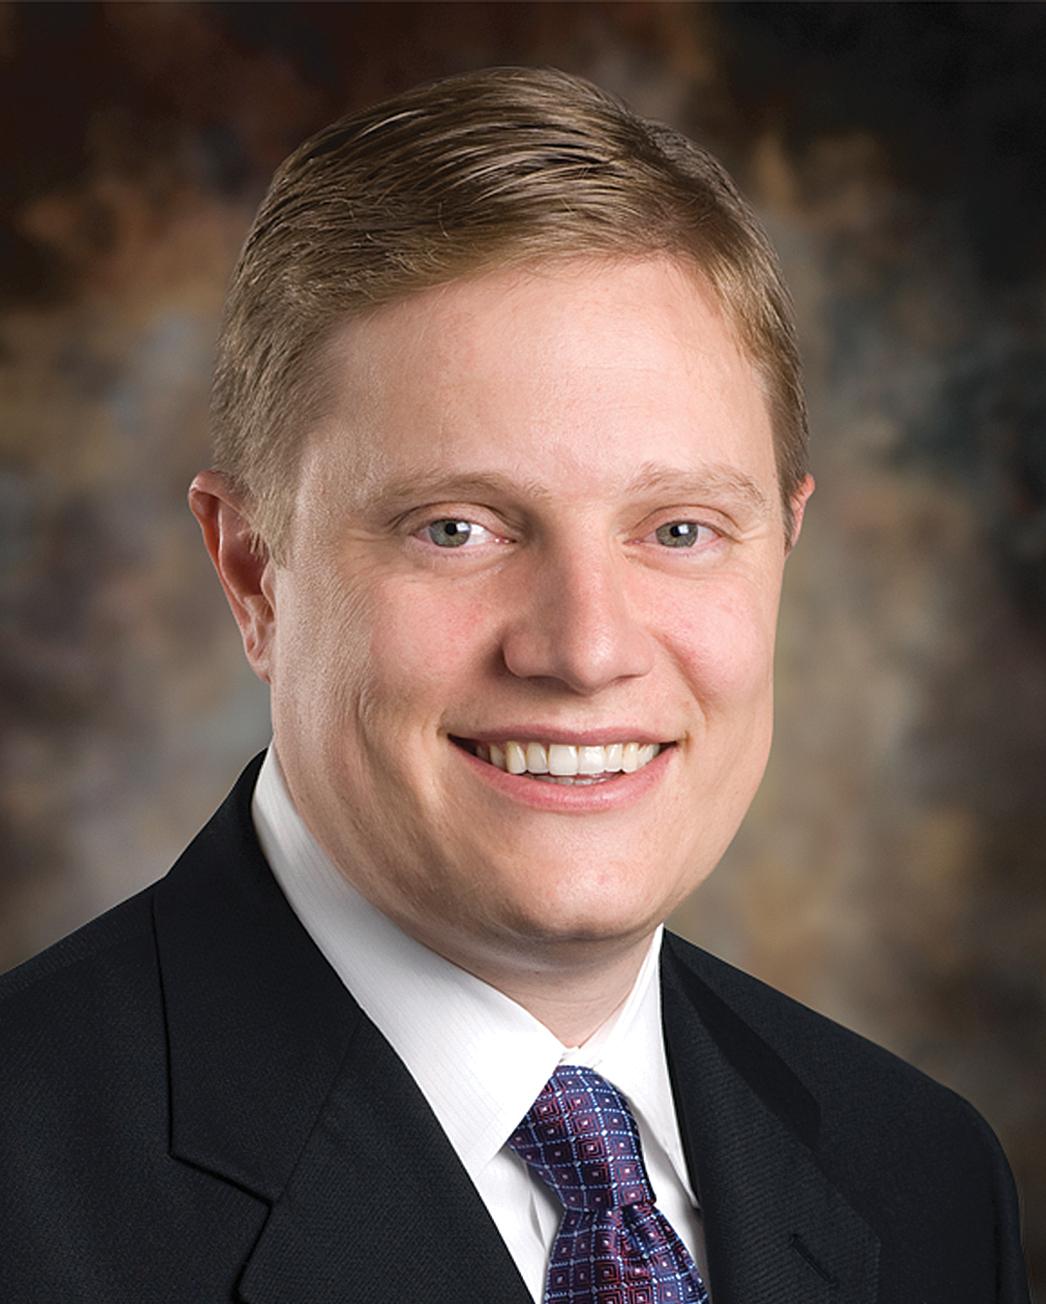 David Spetzler, Ph.D., MBA